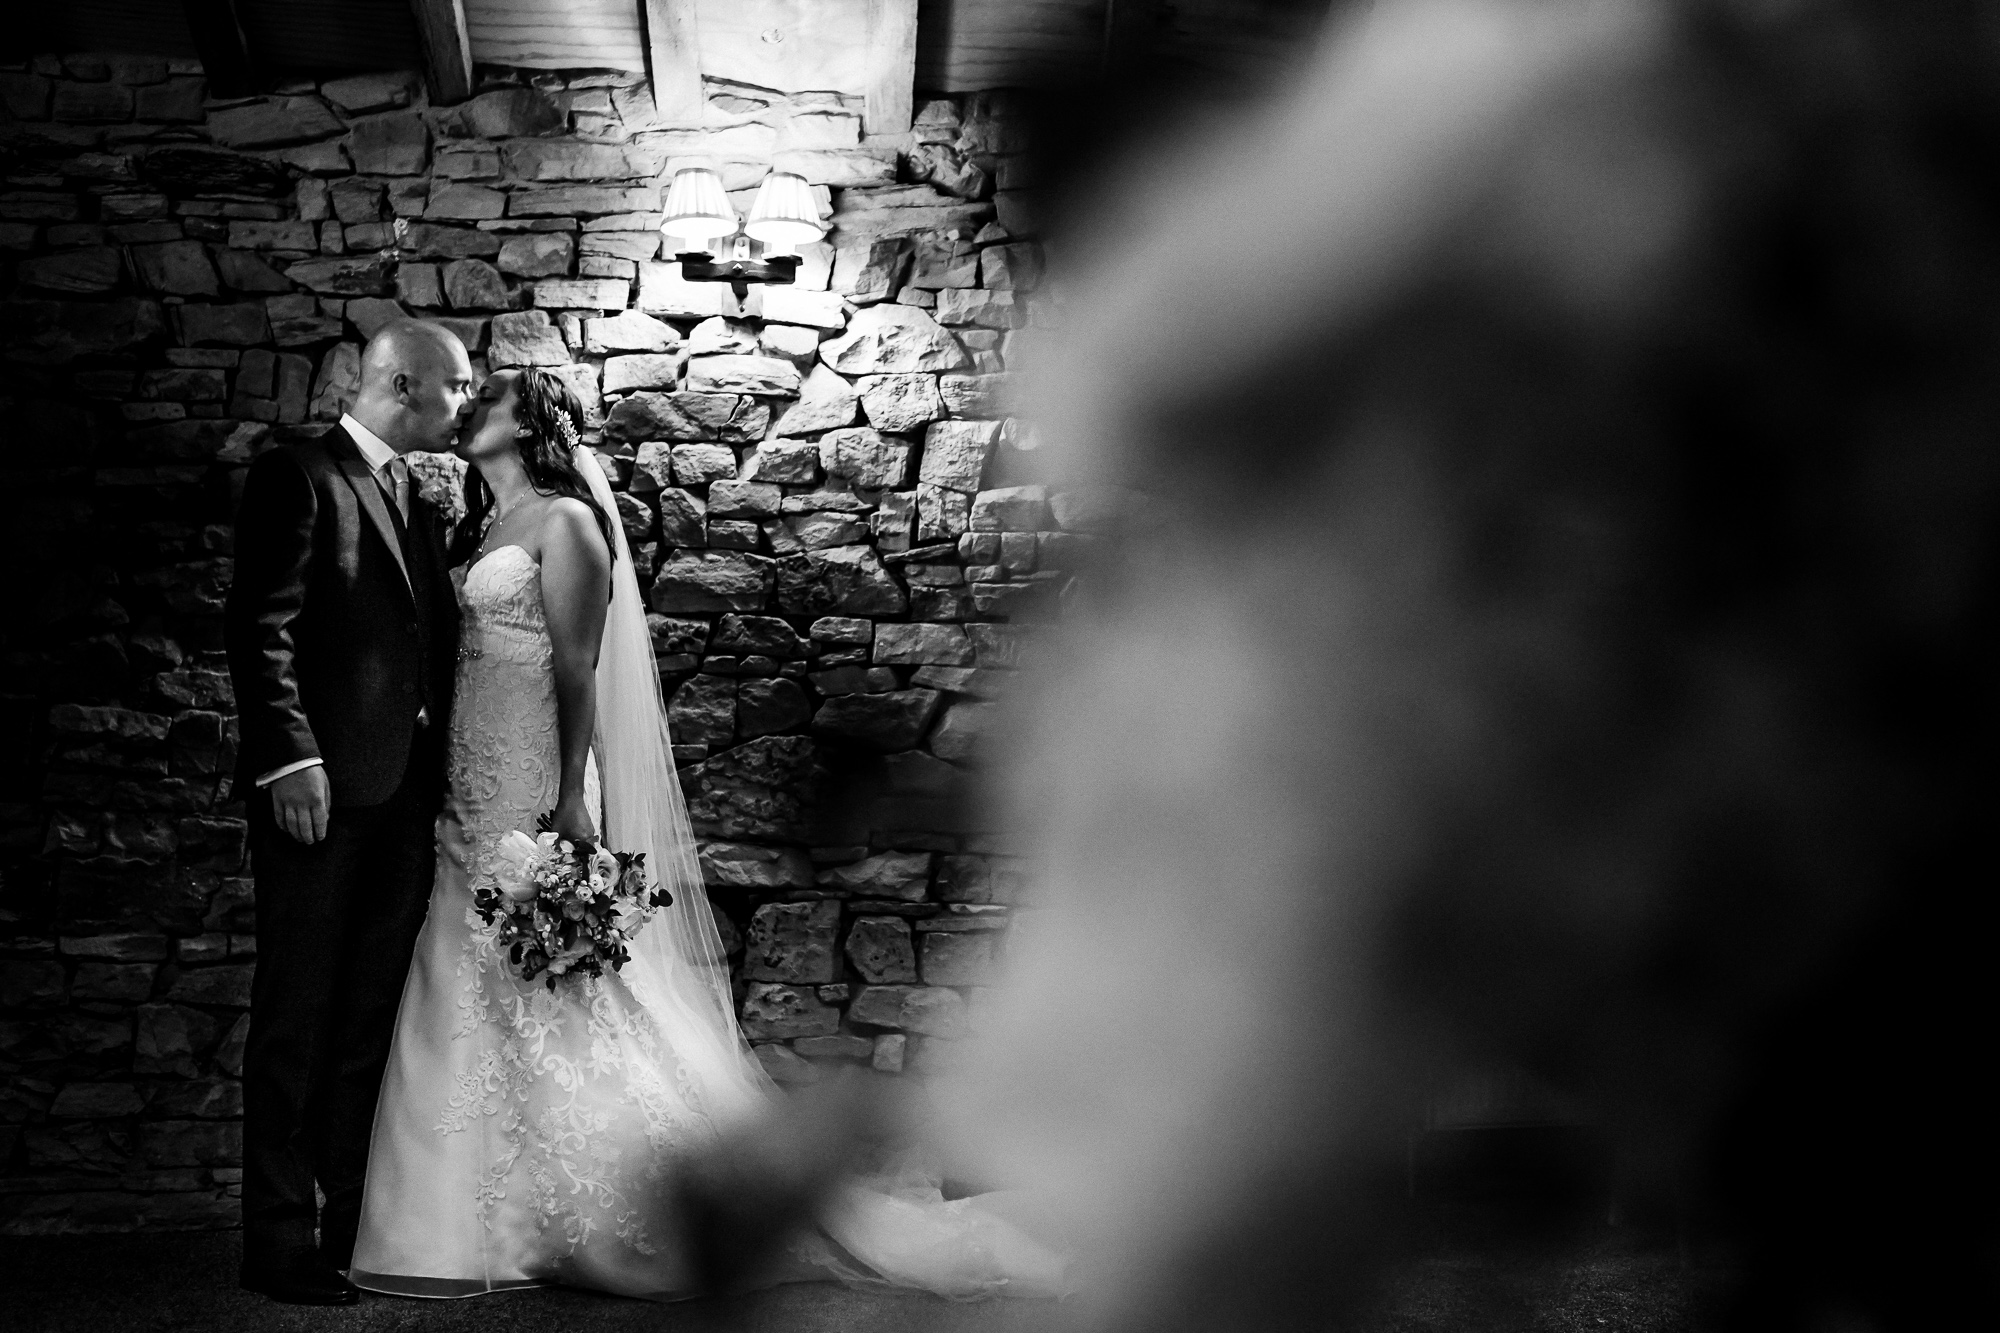 Hyde Bank Farm Wedding Photography Manchester wedding photographer (36 of 49).jpg